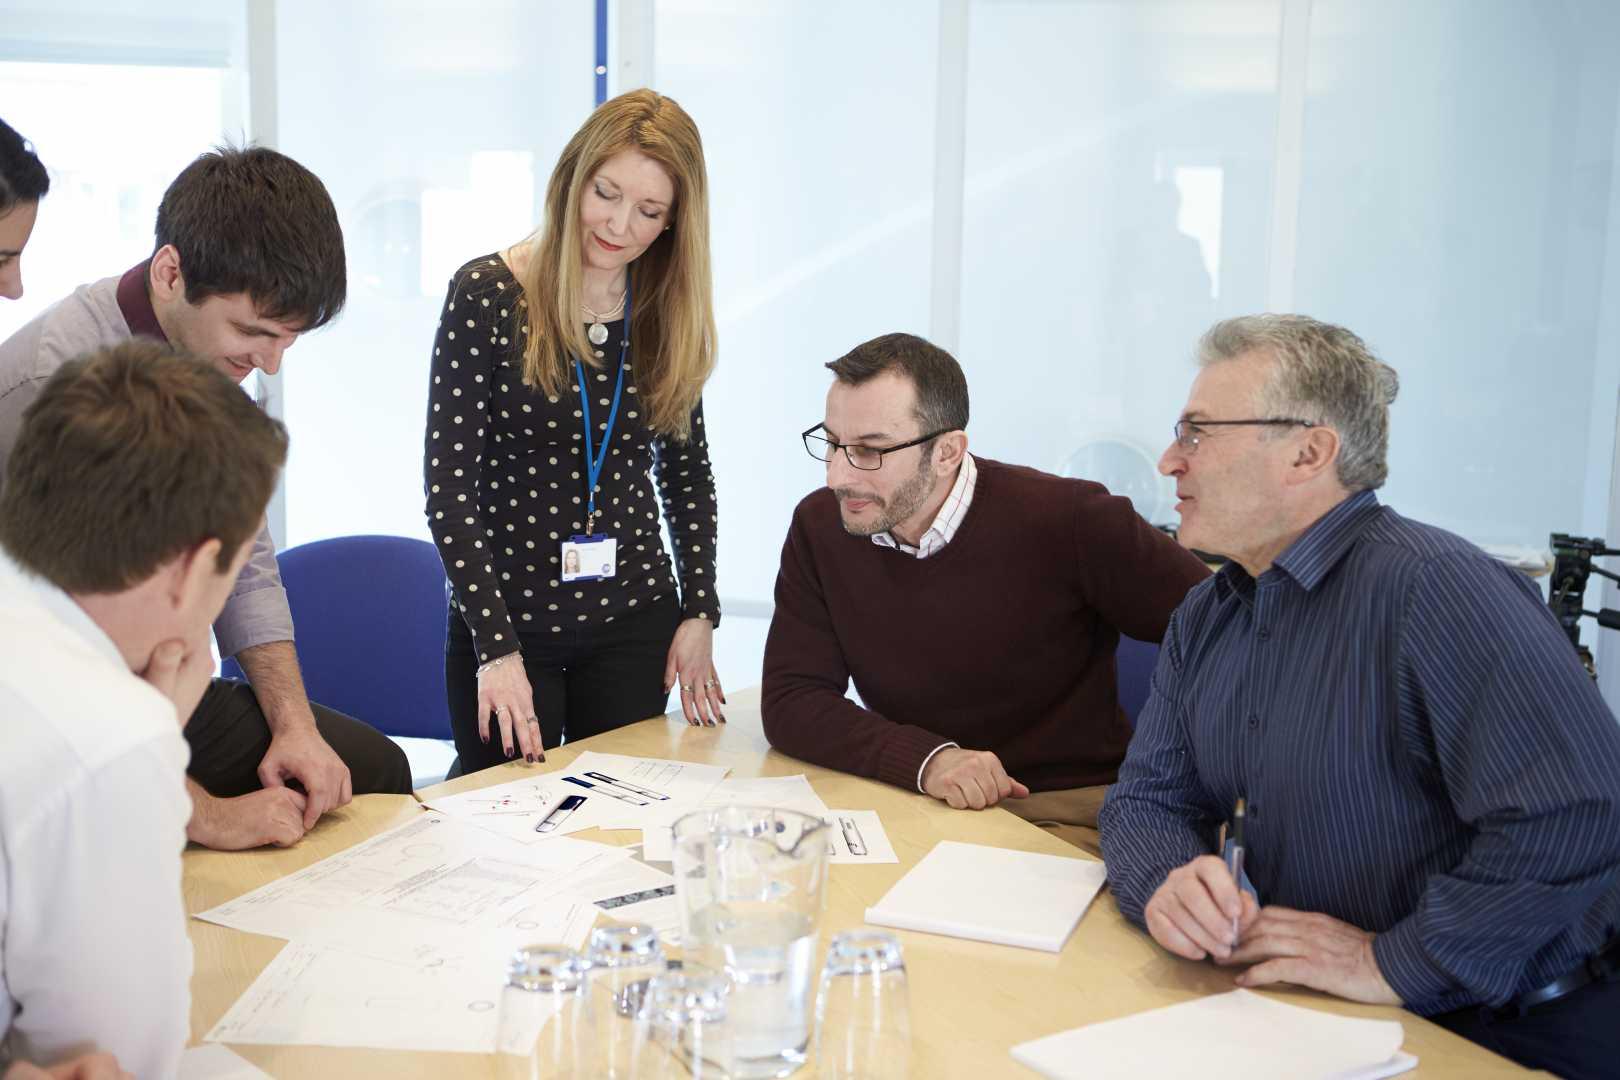 Owen Mumford: Behind the scenes: R&D in medical device design 1